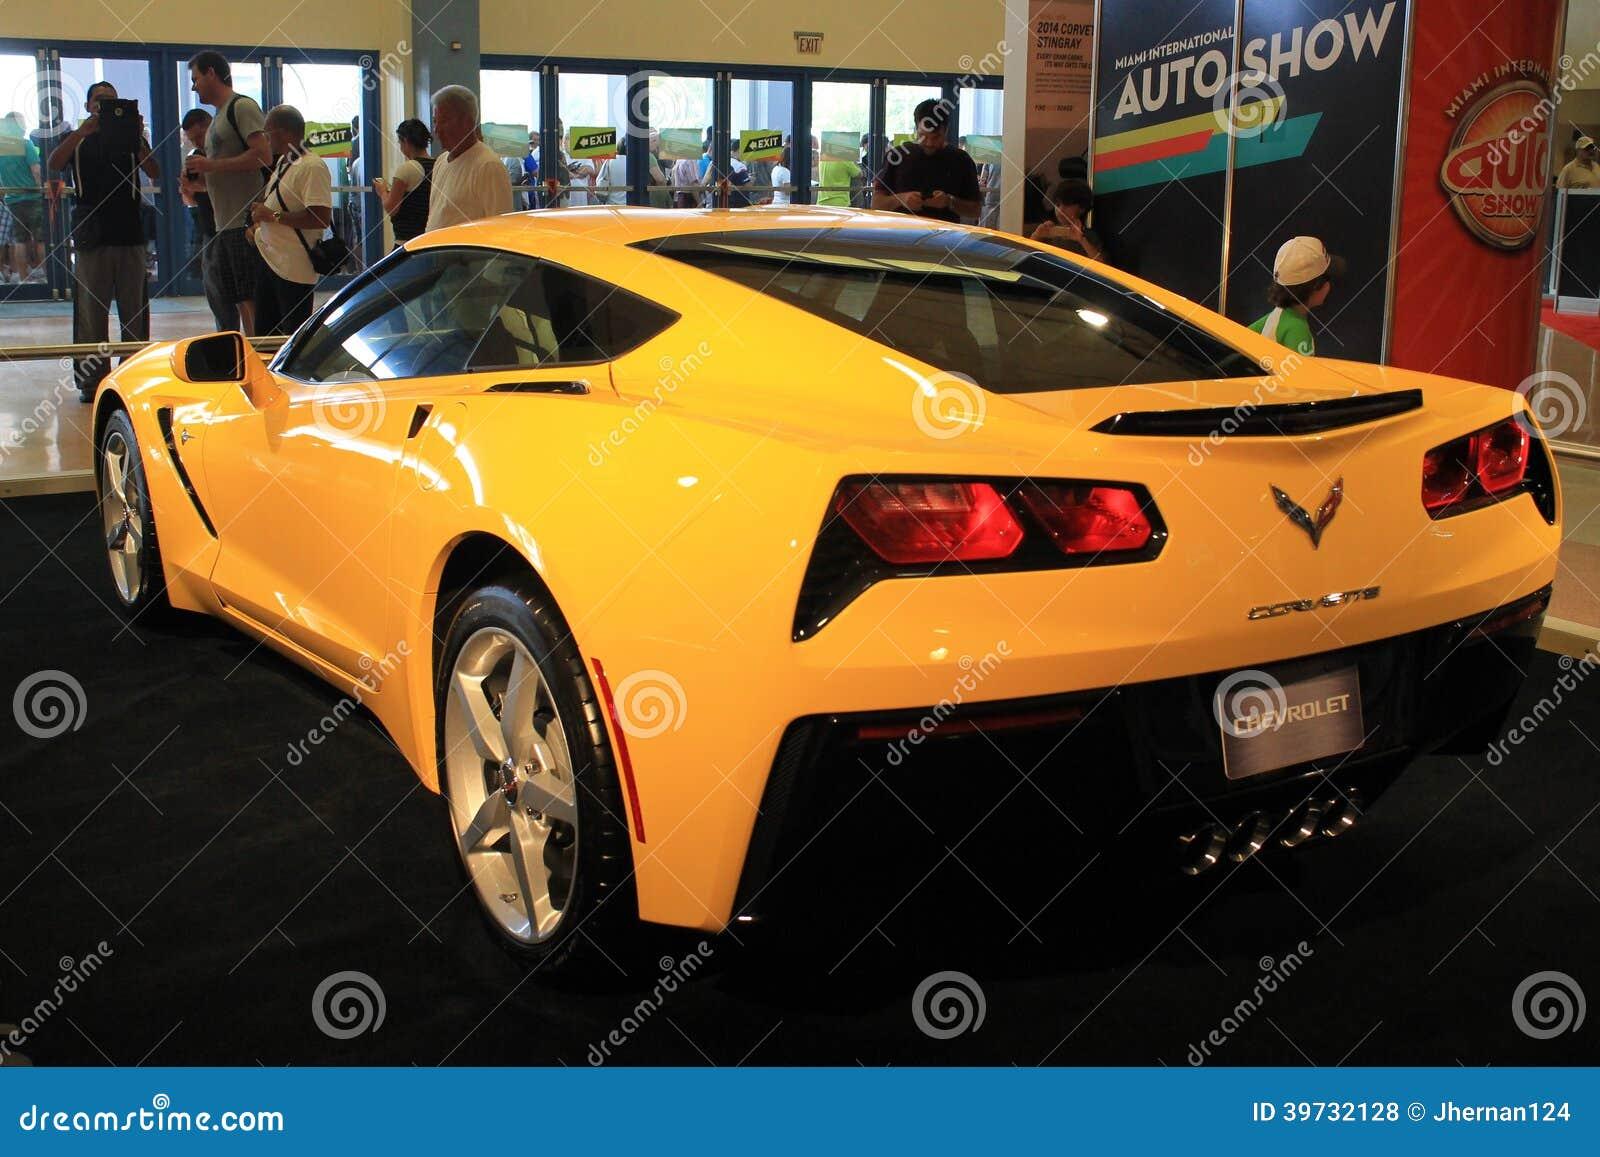 Brand New American Sports Car